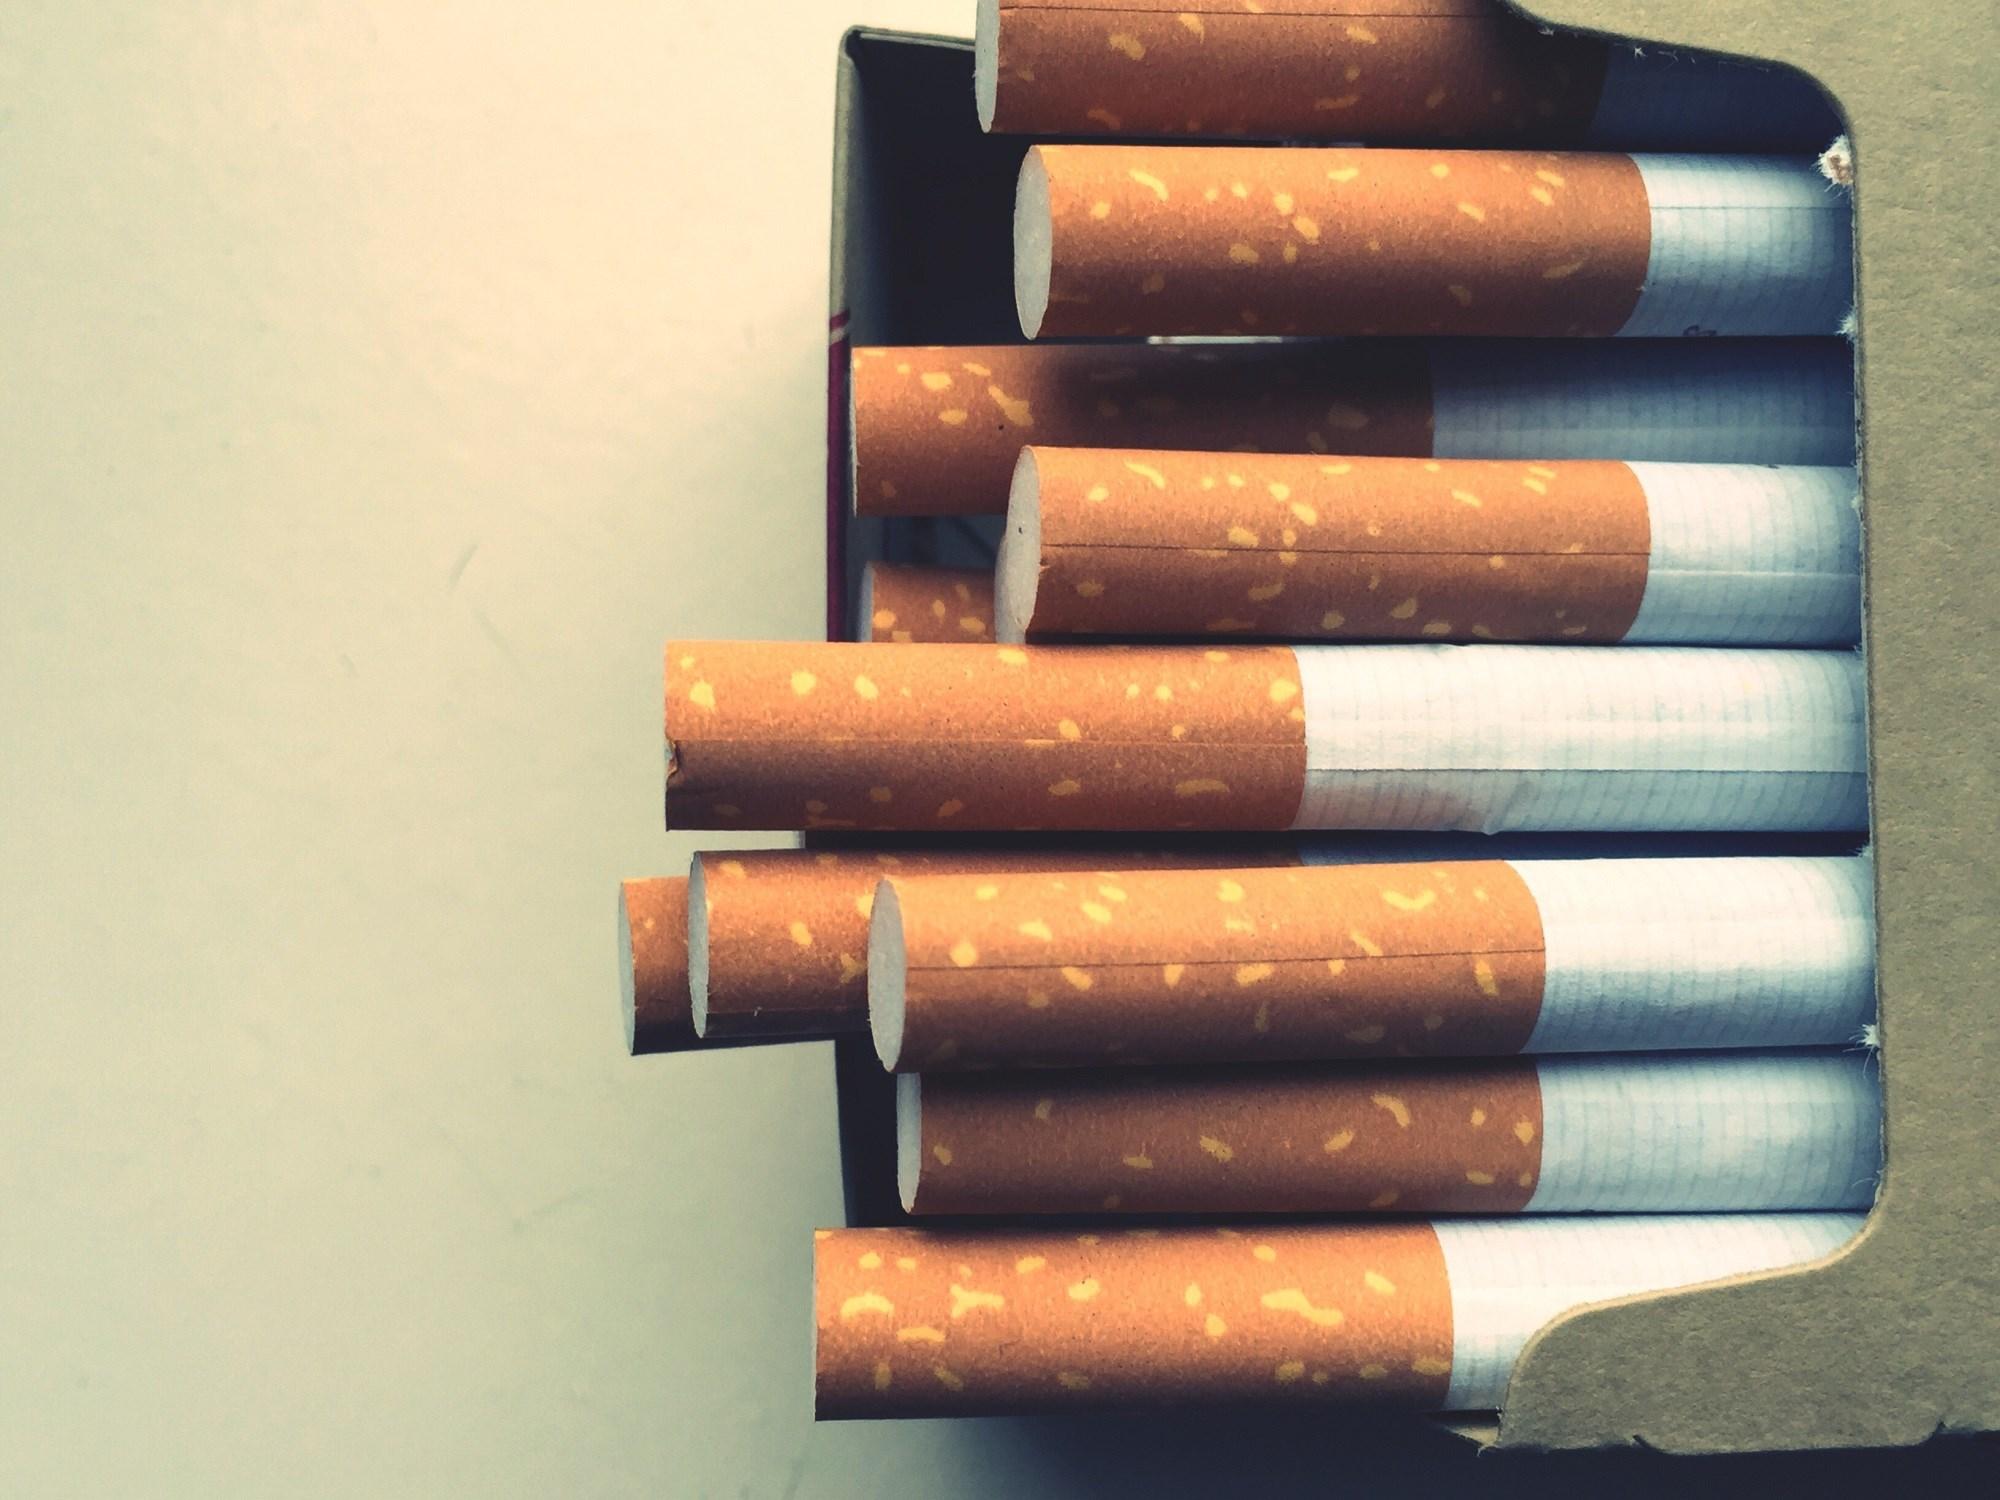 Smoking Linked to Adverse Disease Profile in Axial Spondyloarthritis